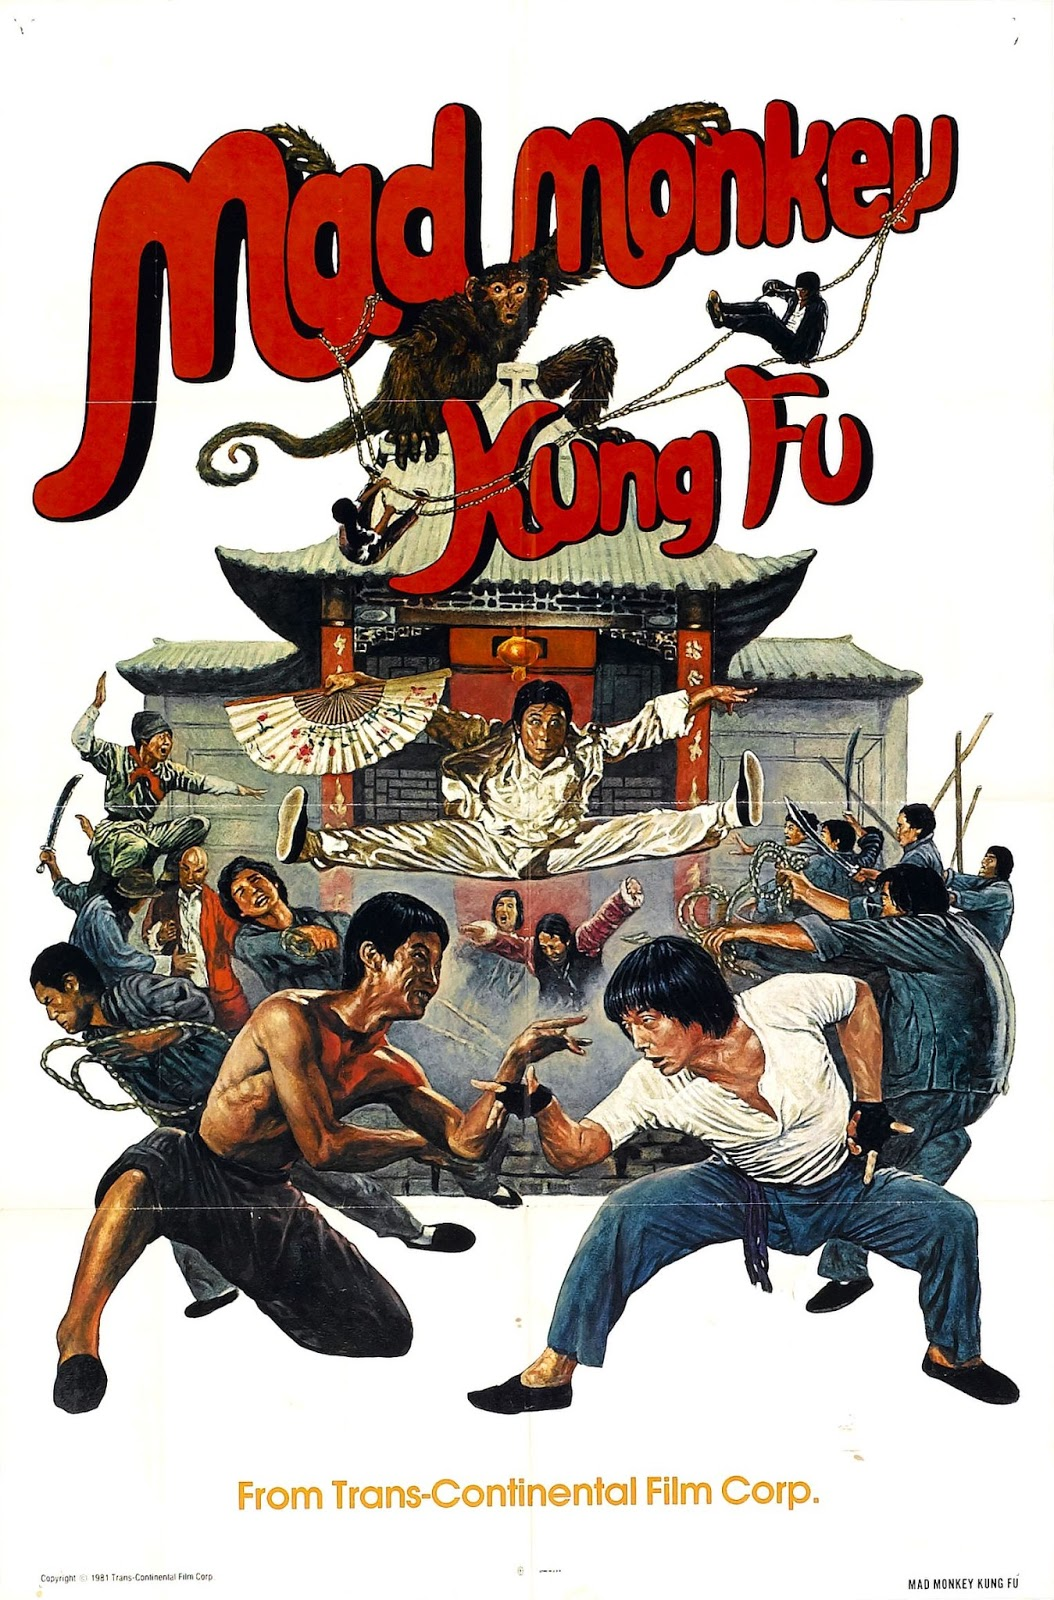 Uncultured Swine Mad Monkey Kung Fu Goin Ape Shit The Feature Film #u uncultured swine #samoa joe #raw #lb #i love u but you're annoying. uncultured swine blogger